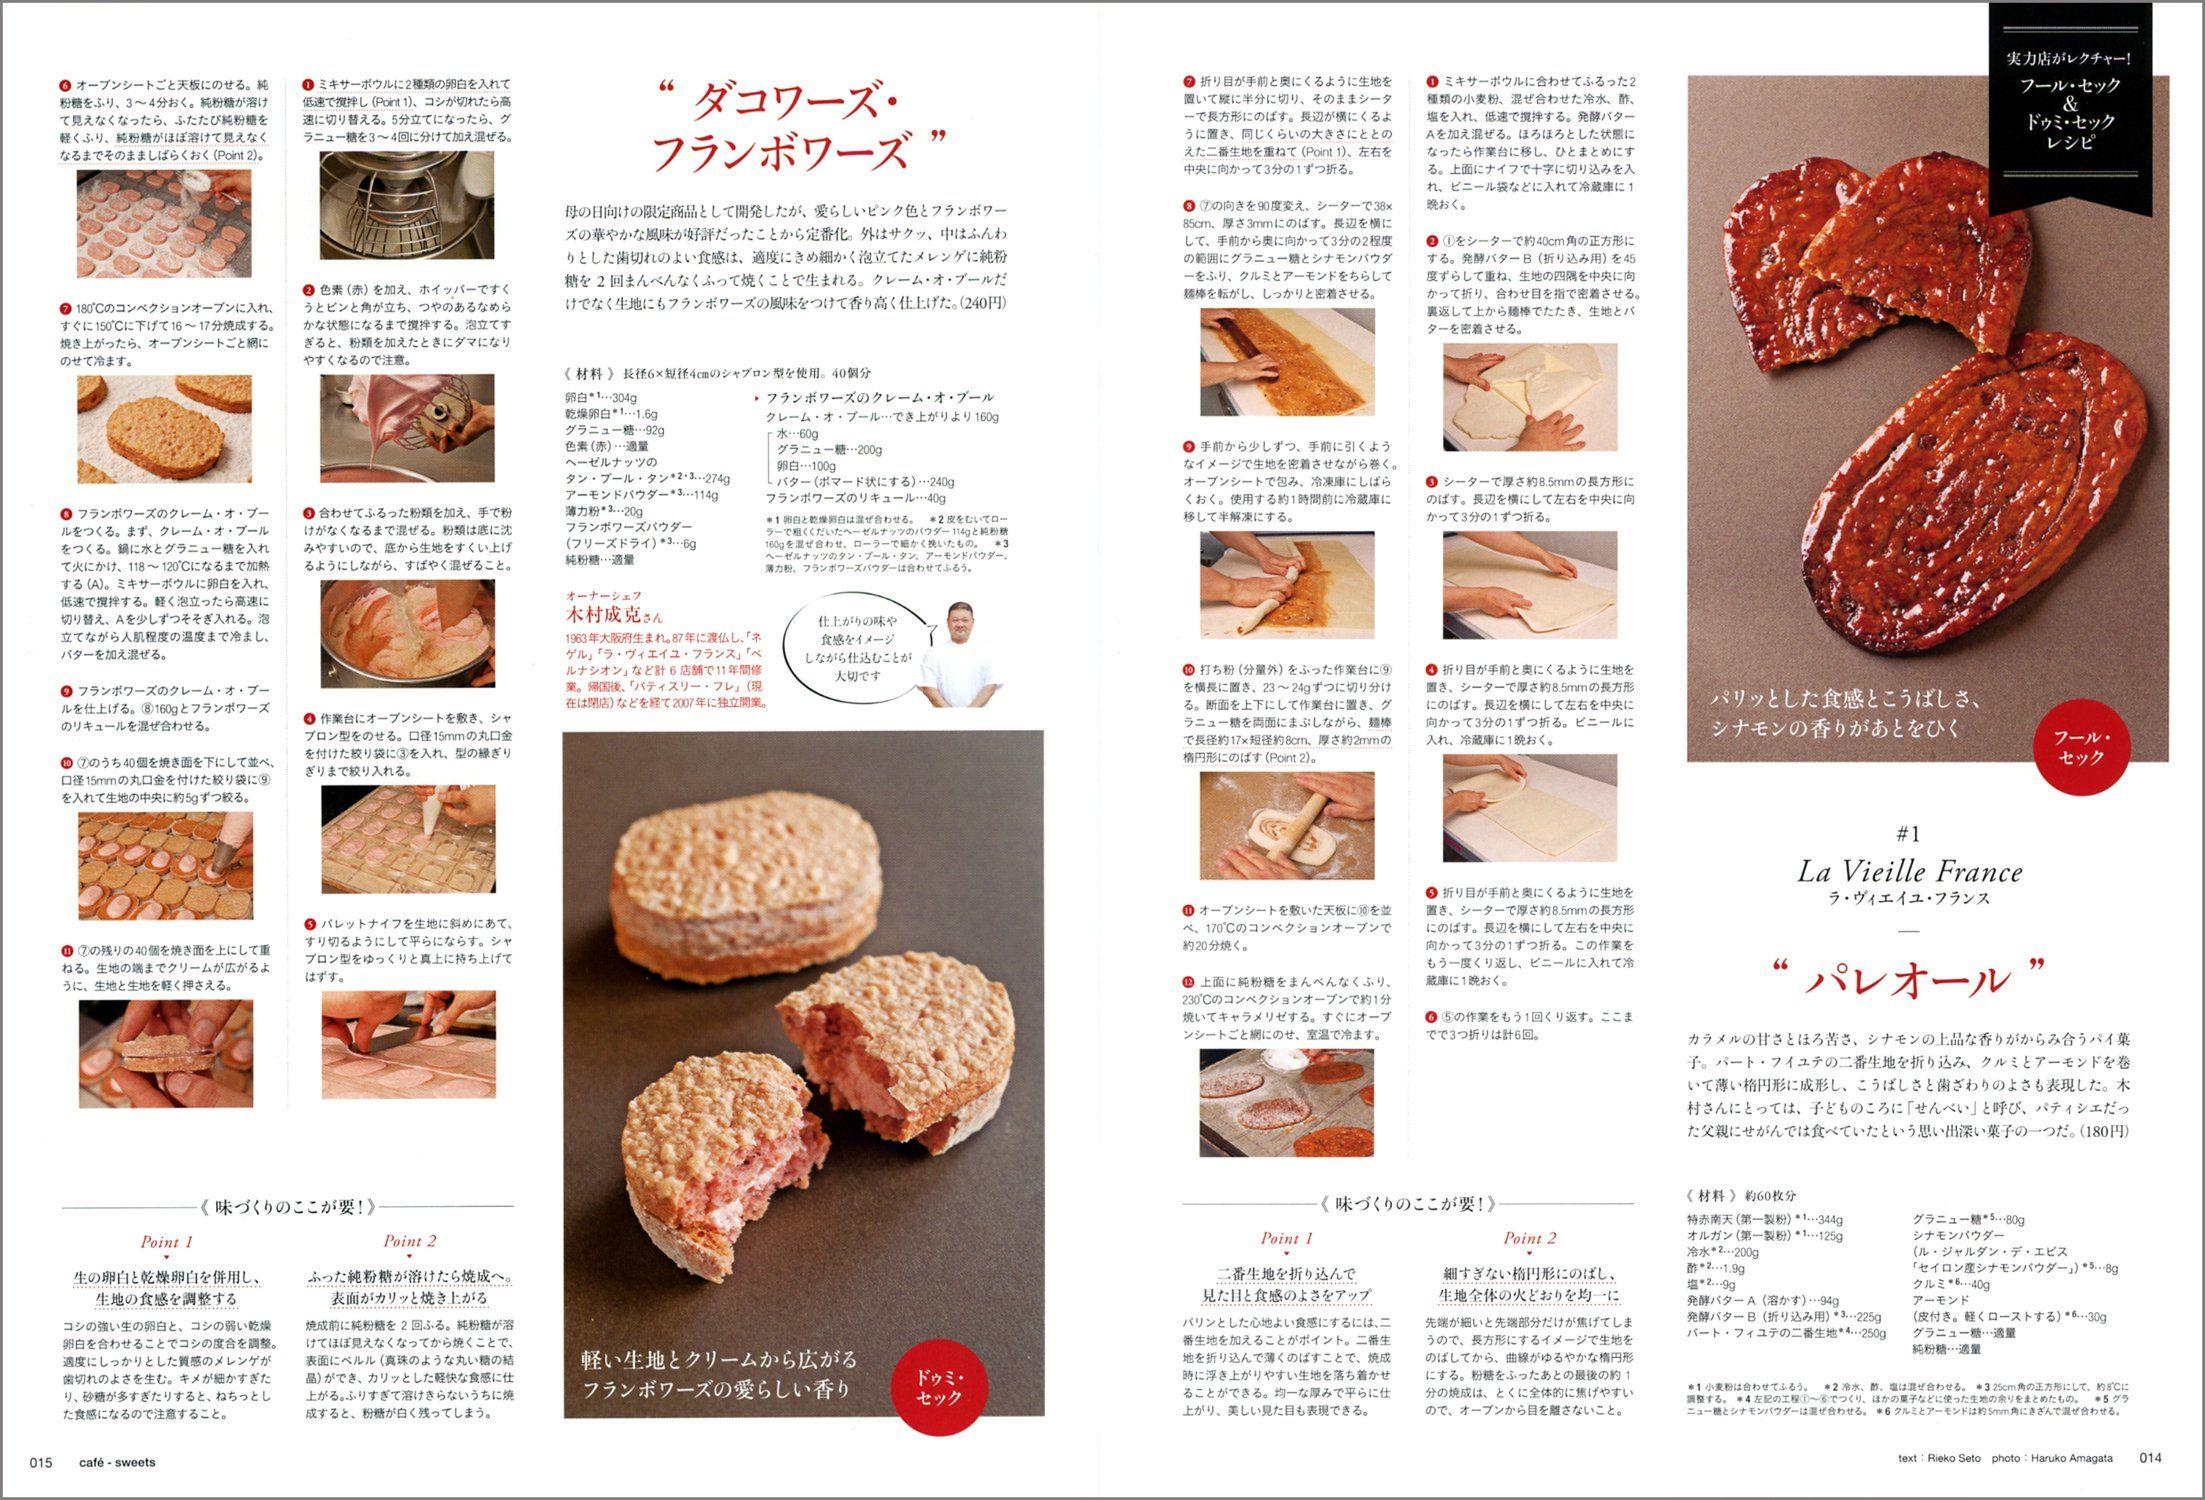 Amazon.co.jp: cafesweets (カフェスイーツ) vol.172 (柴田書店MOOK